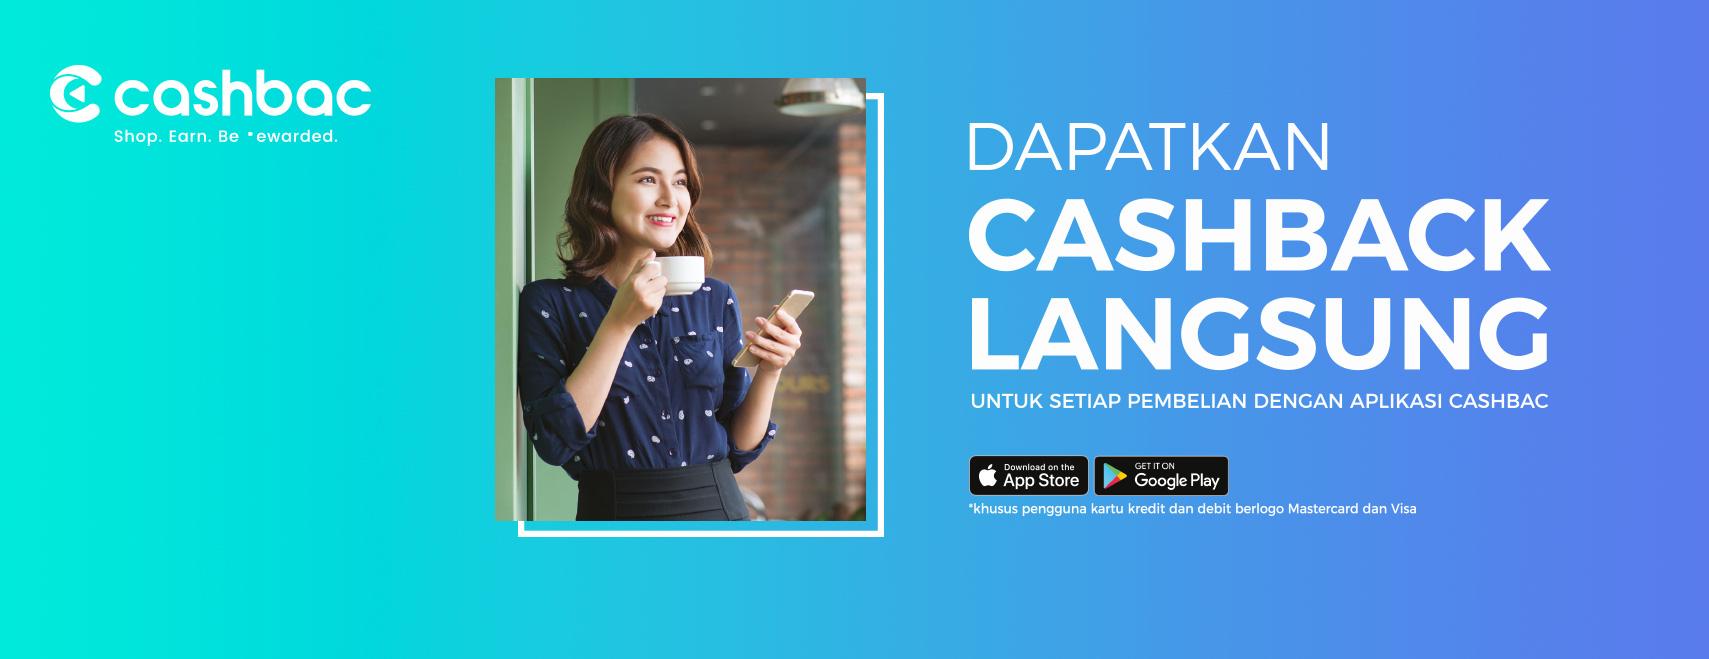 Aplikasi Cashbac